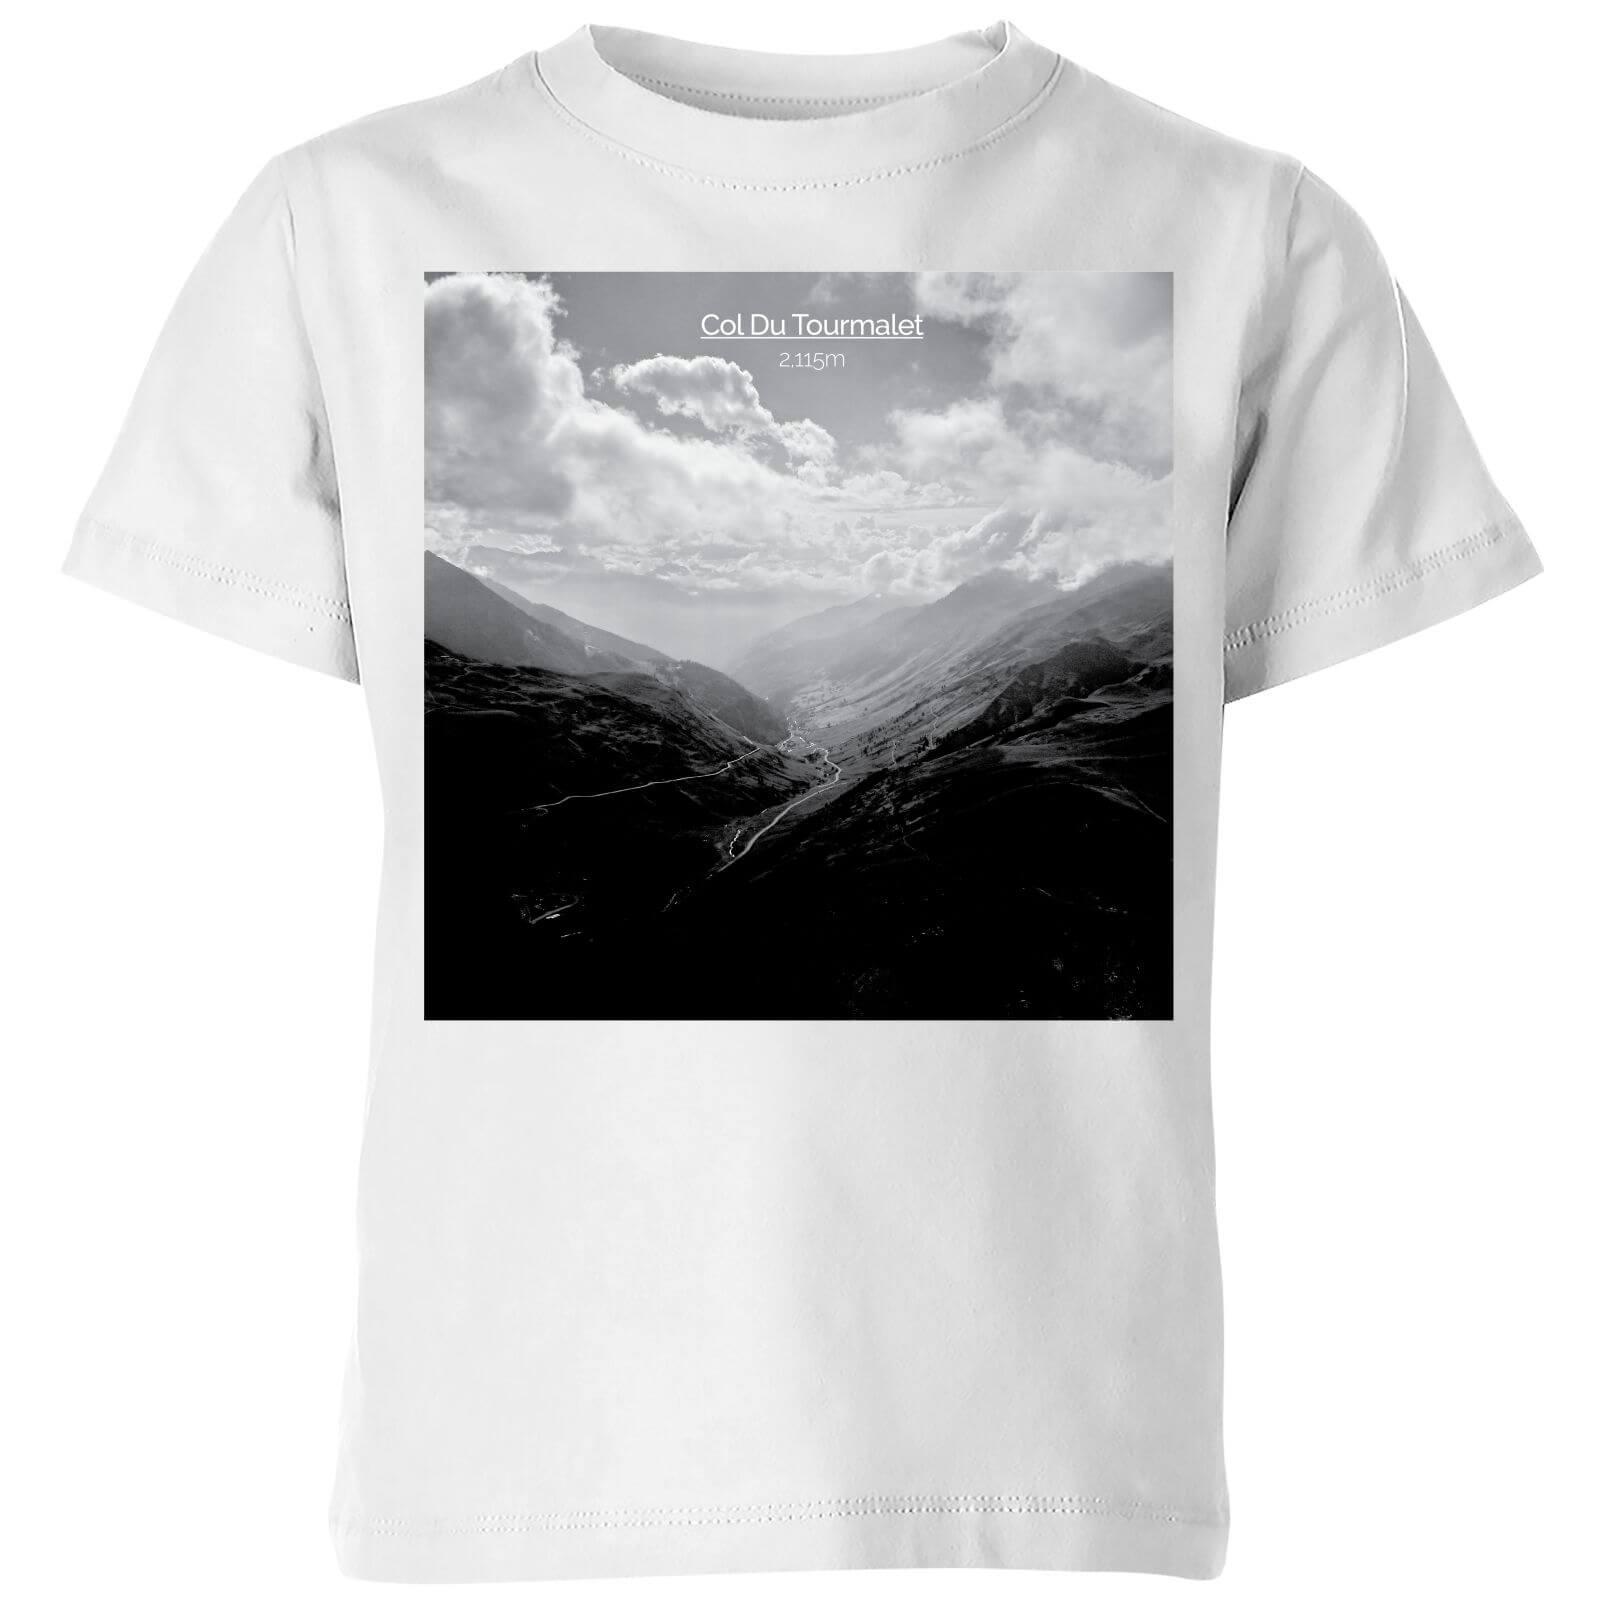 Summit Finish Col du Tourmalet Scenery Kids' T-Shirt - White - 3-4 Years - White